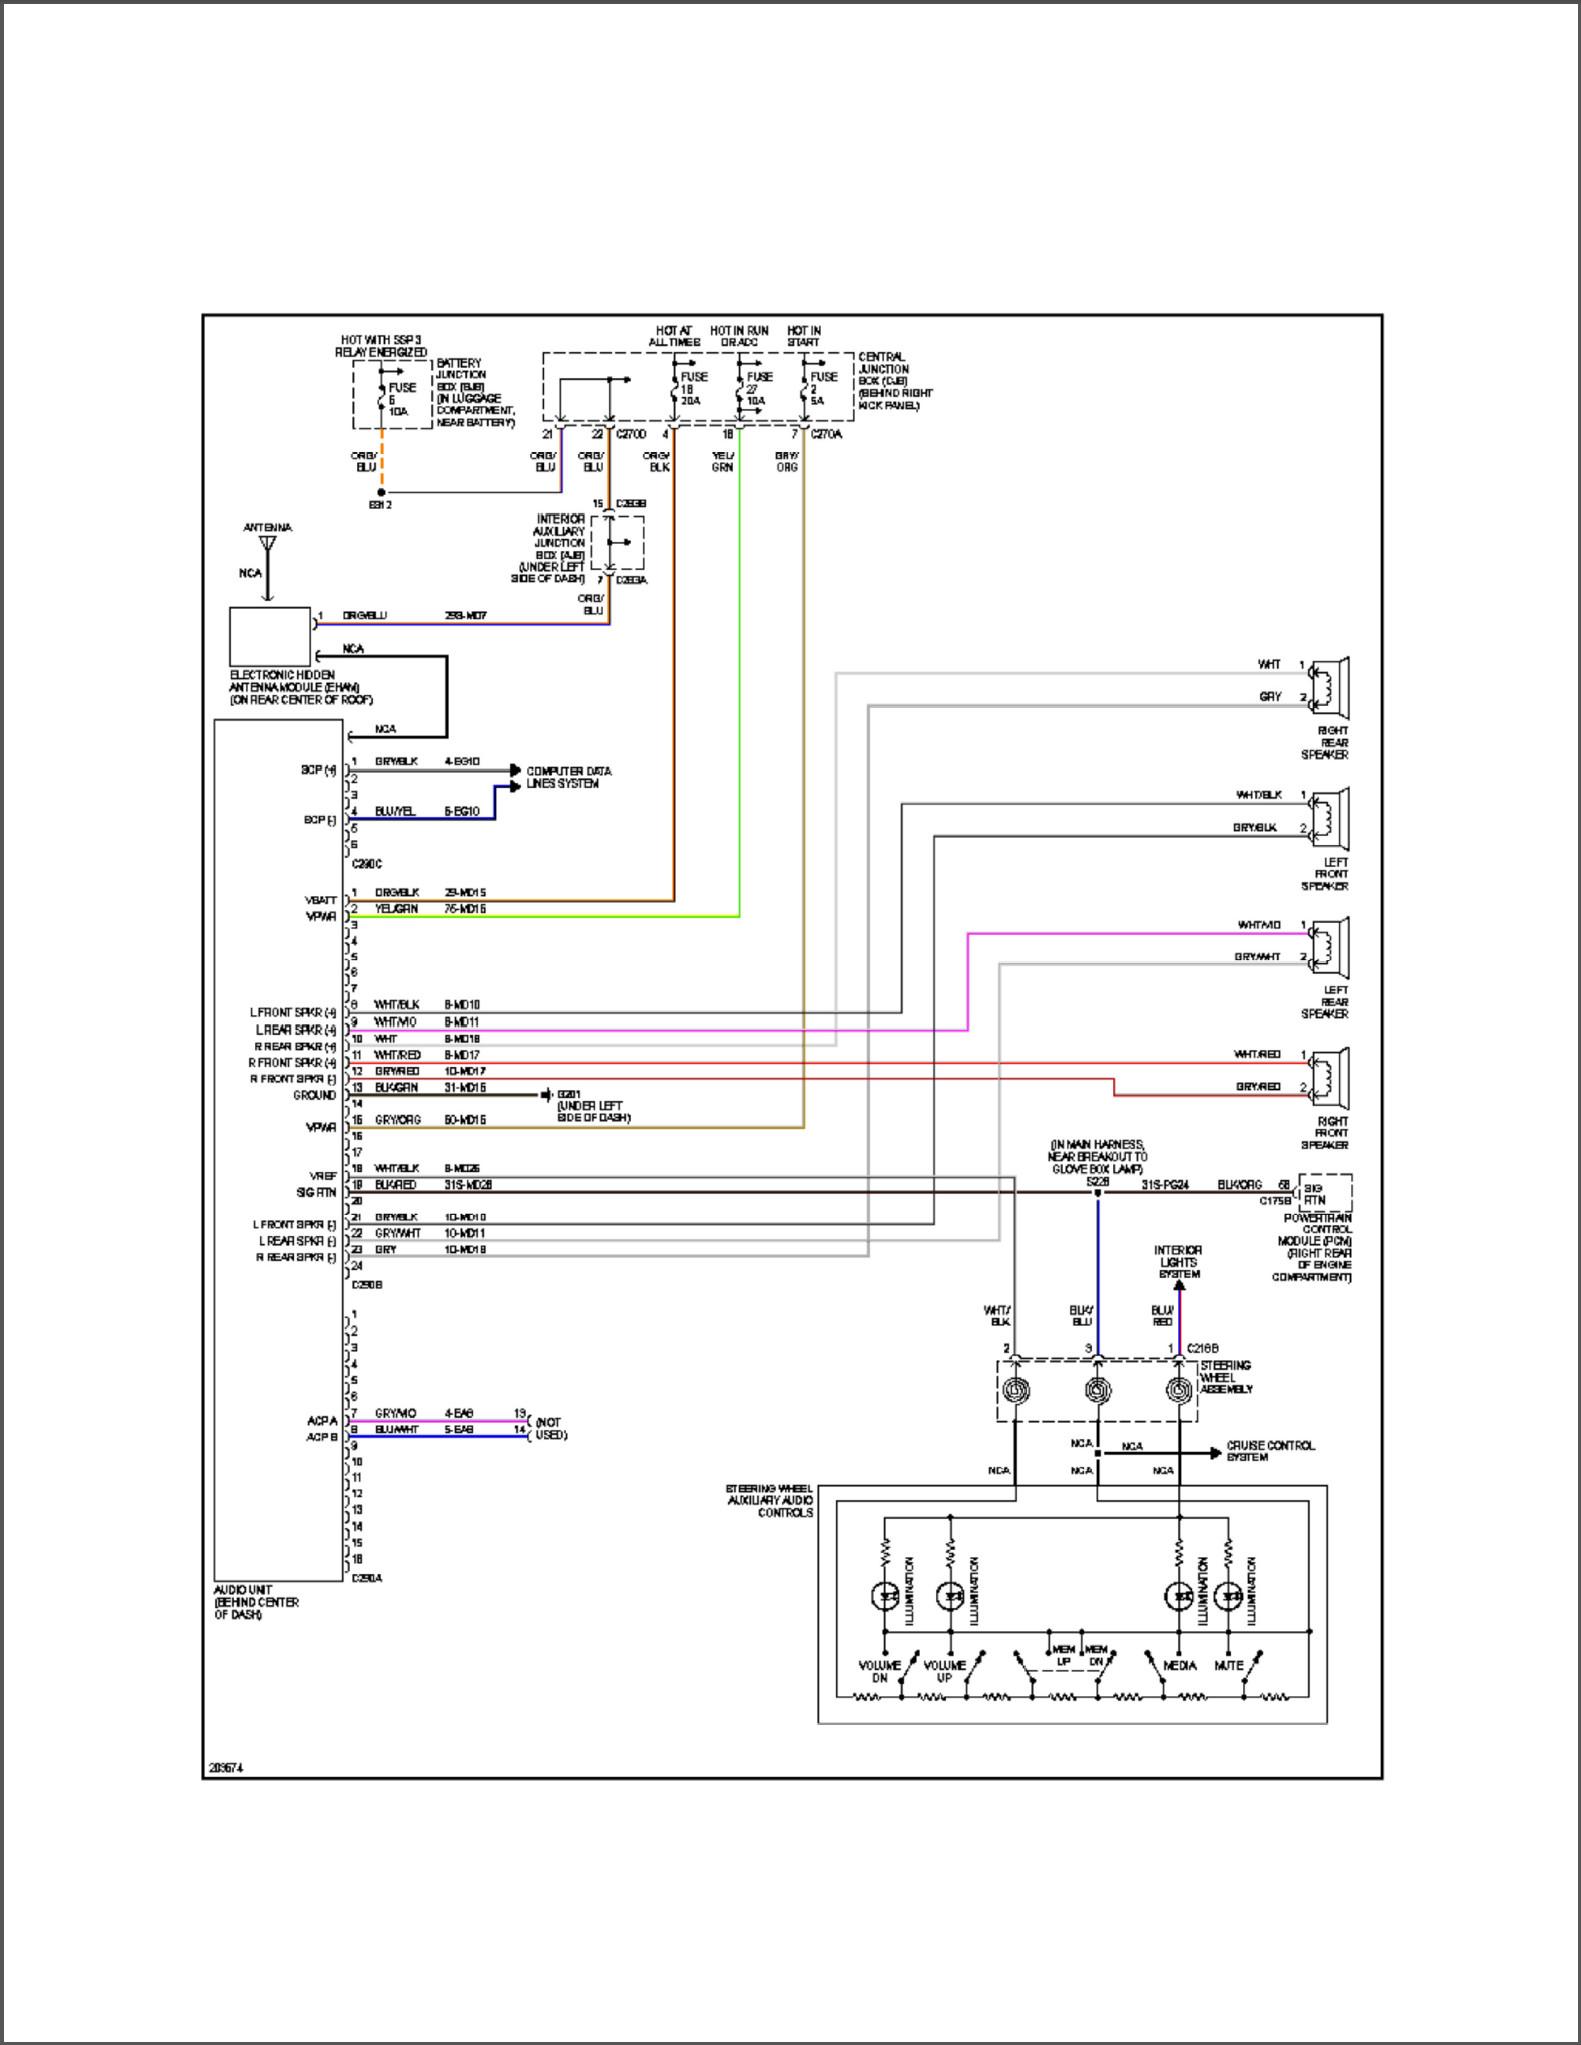 1979 Lincoln Wiring Diagram | Wiring Diagram - Dodge Alternator Wiring Diagram